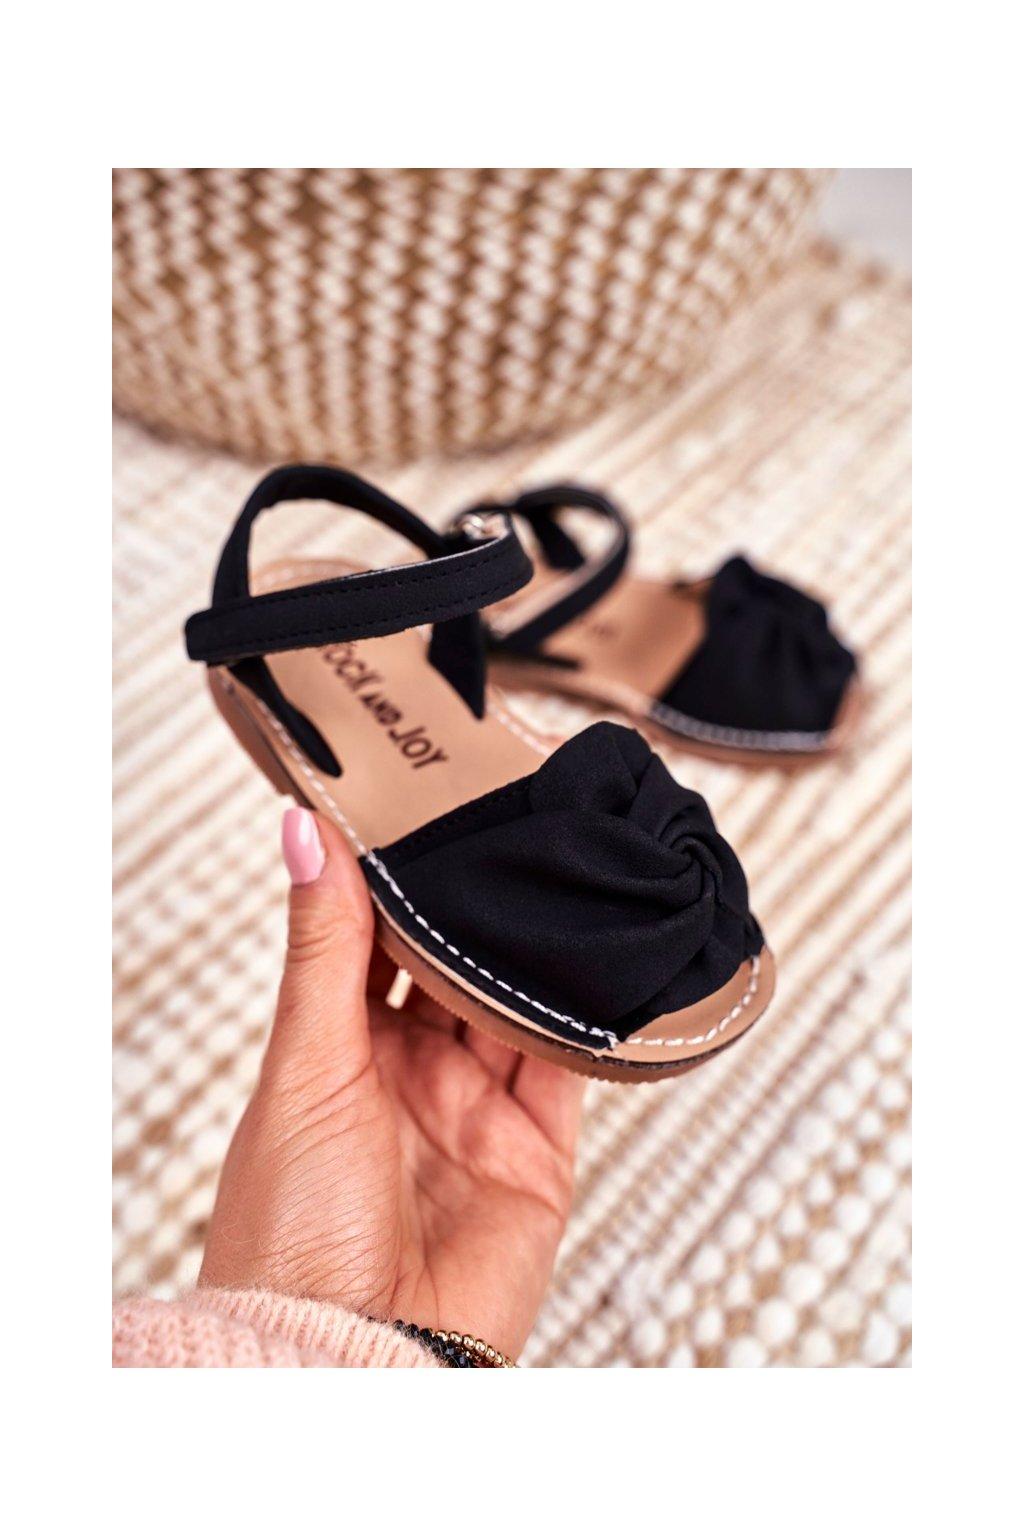 Detské sandále farba čierna NJSK 233 BLK